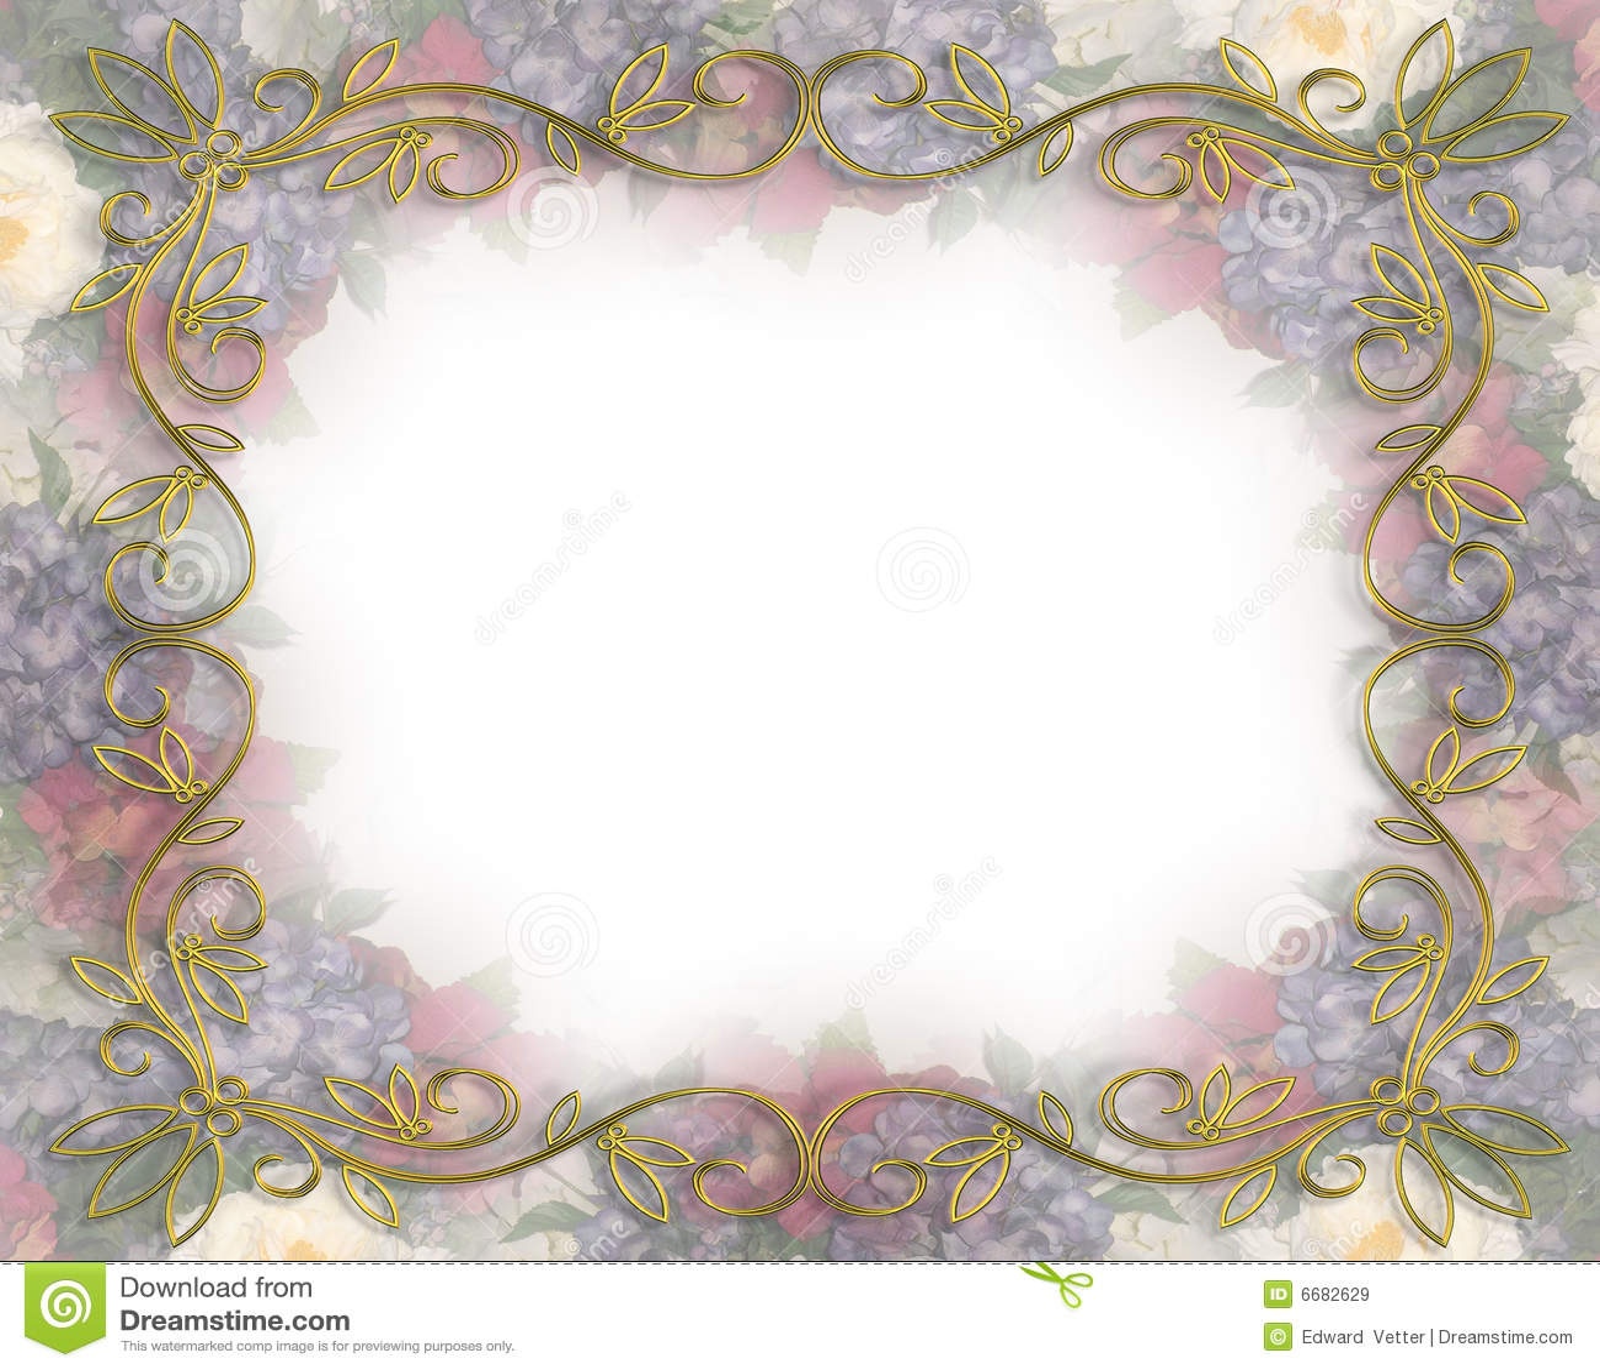 Hydrangea Invitations is perfect invitation example